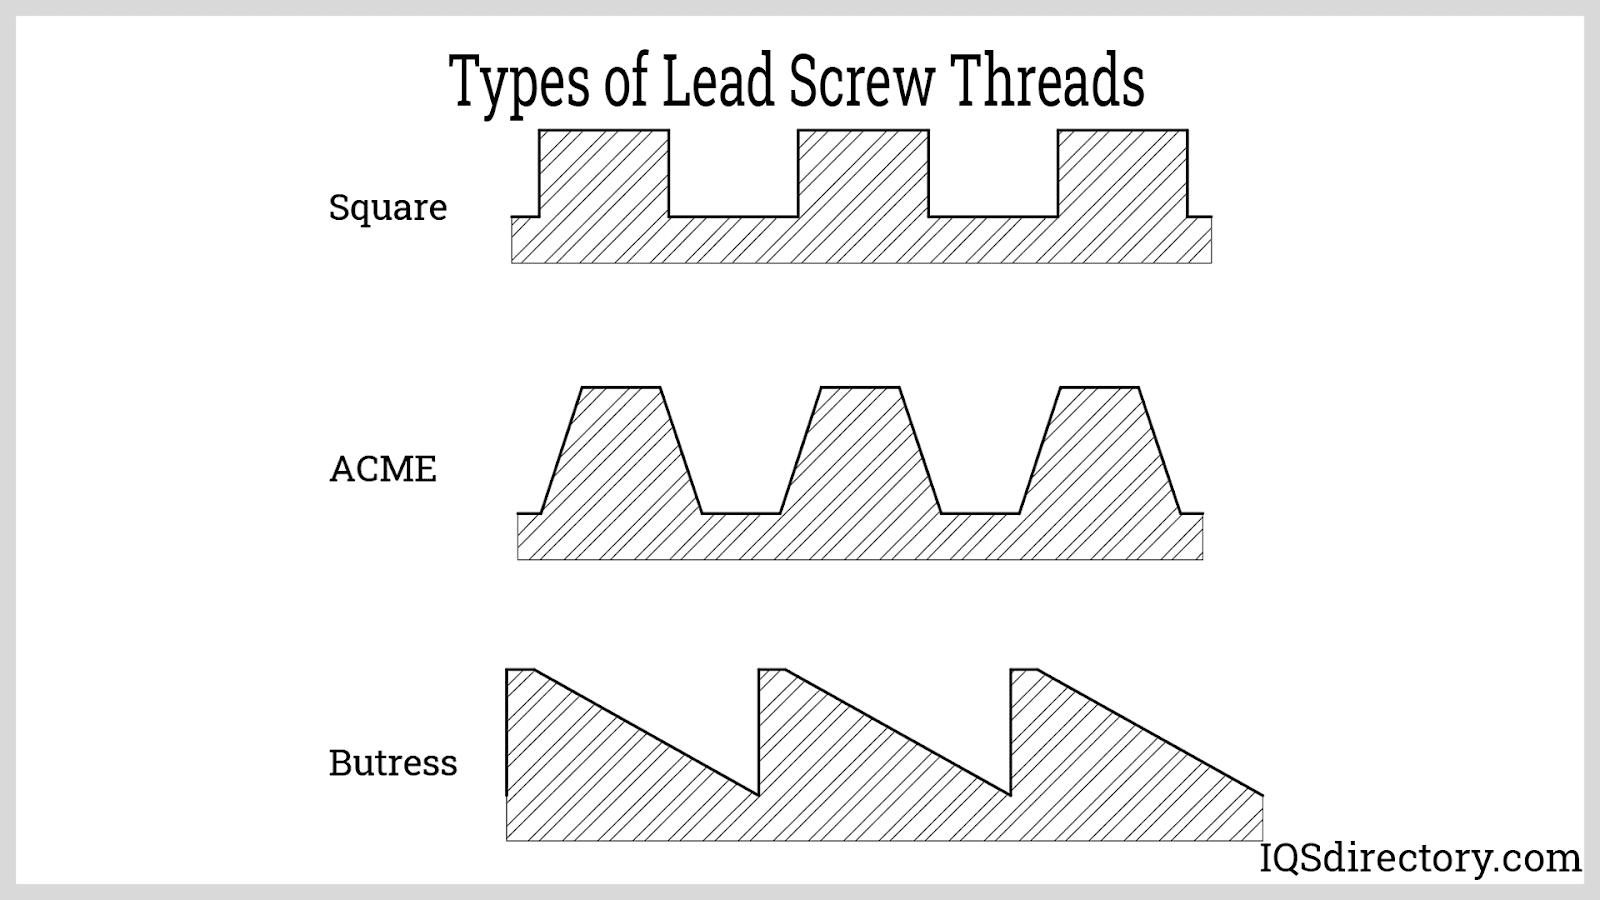 Types of Lead Screw Threads